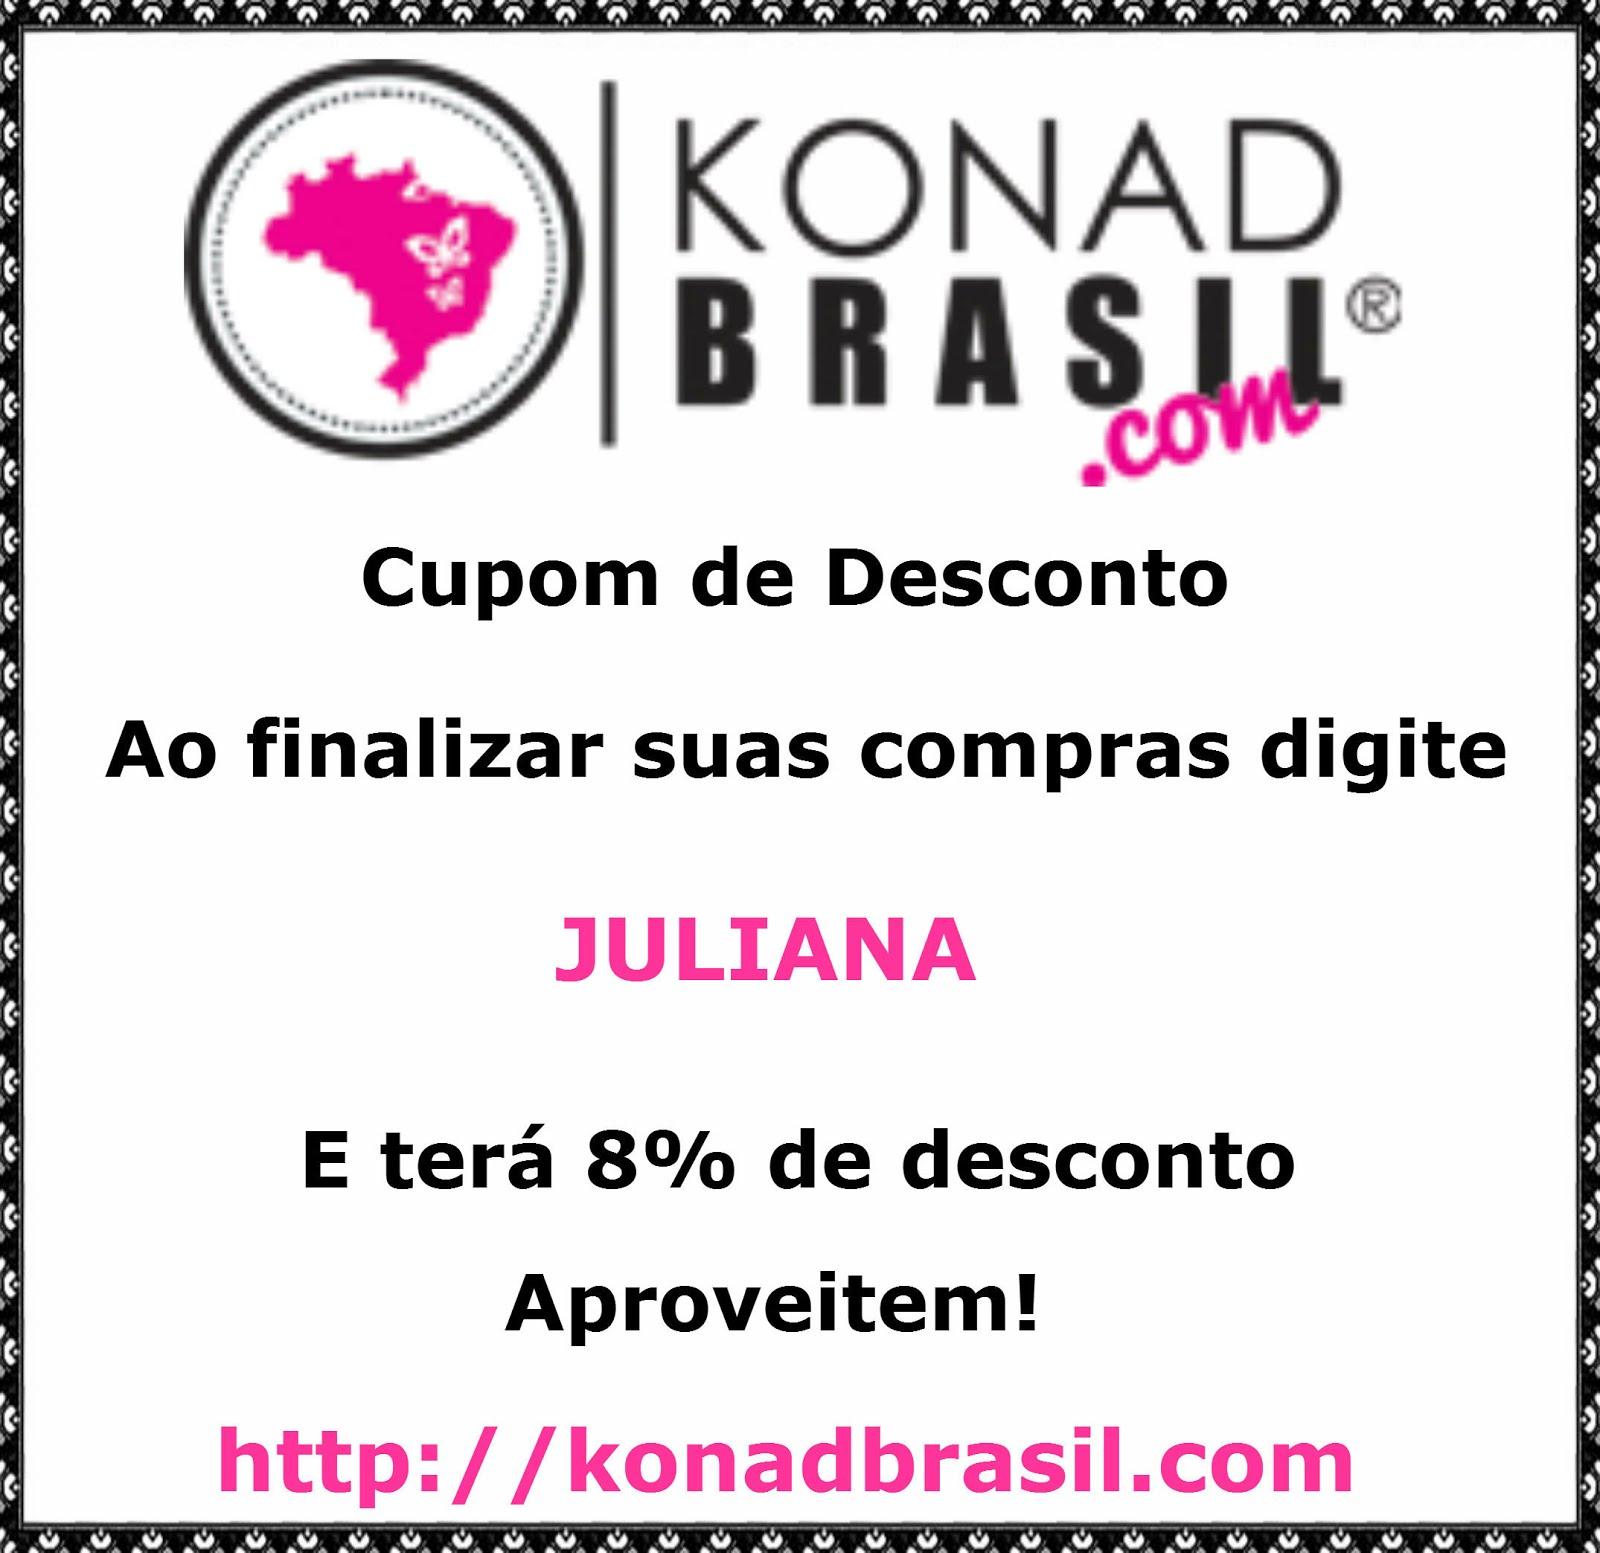 Konad Brasil